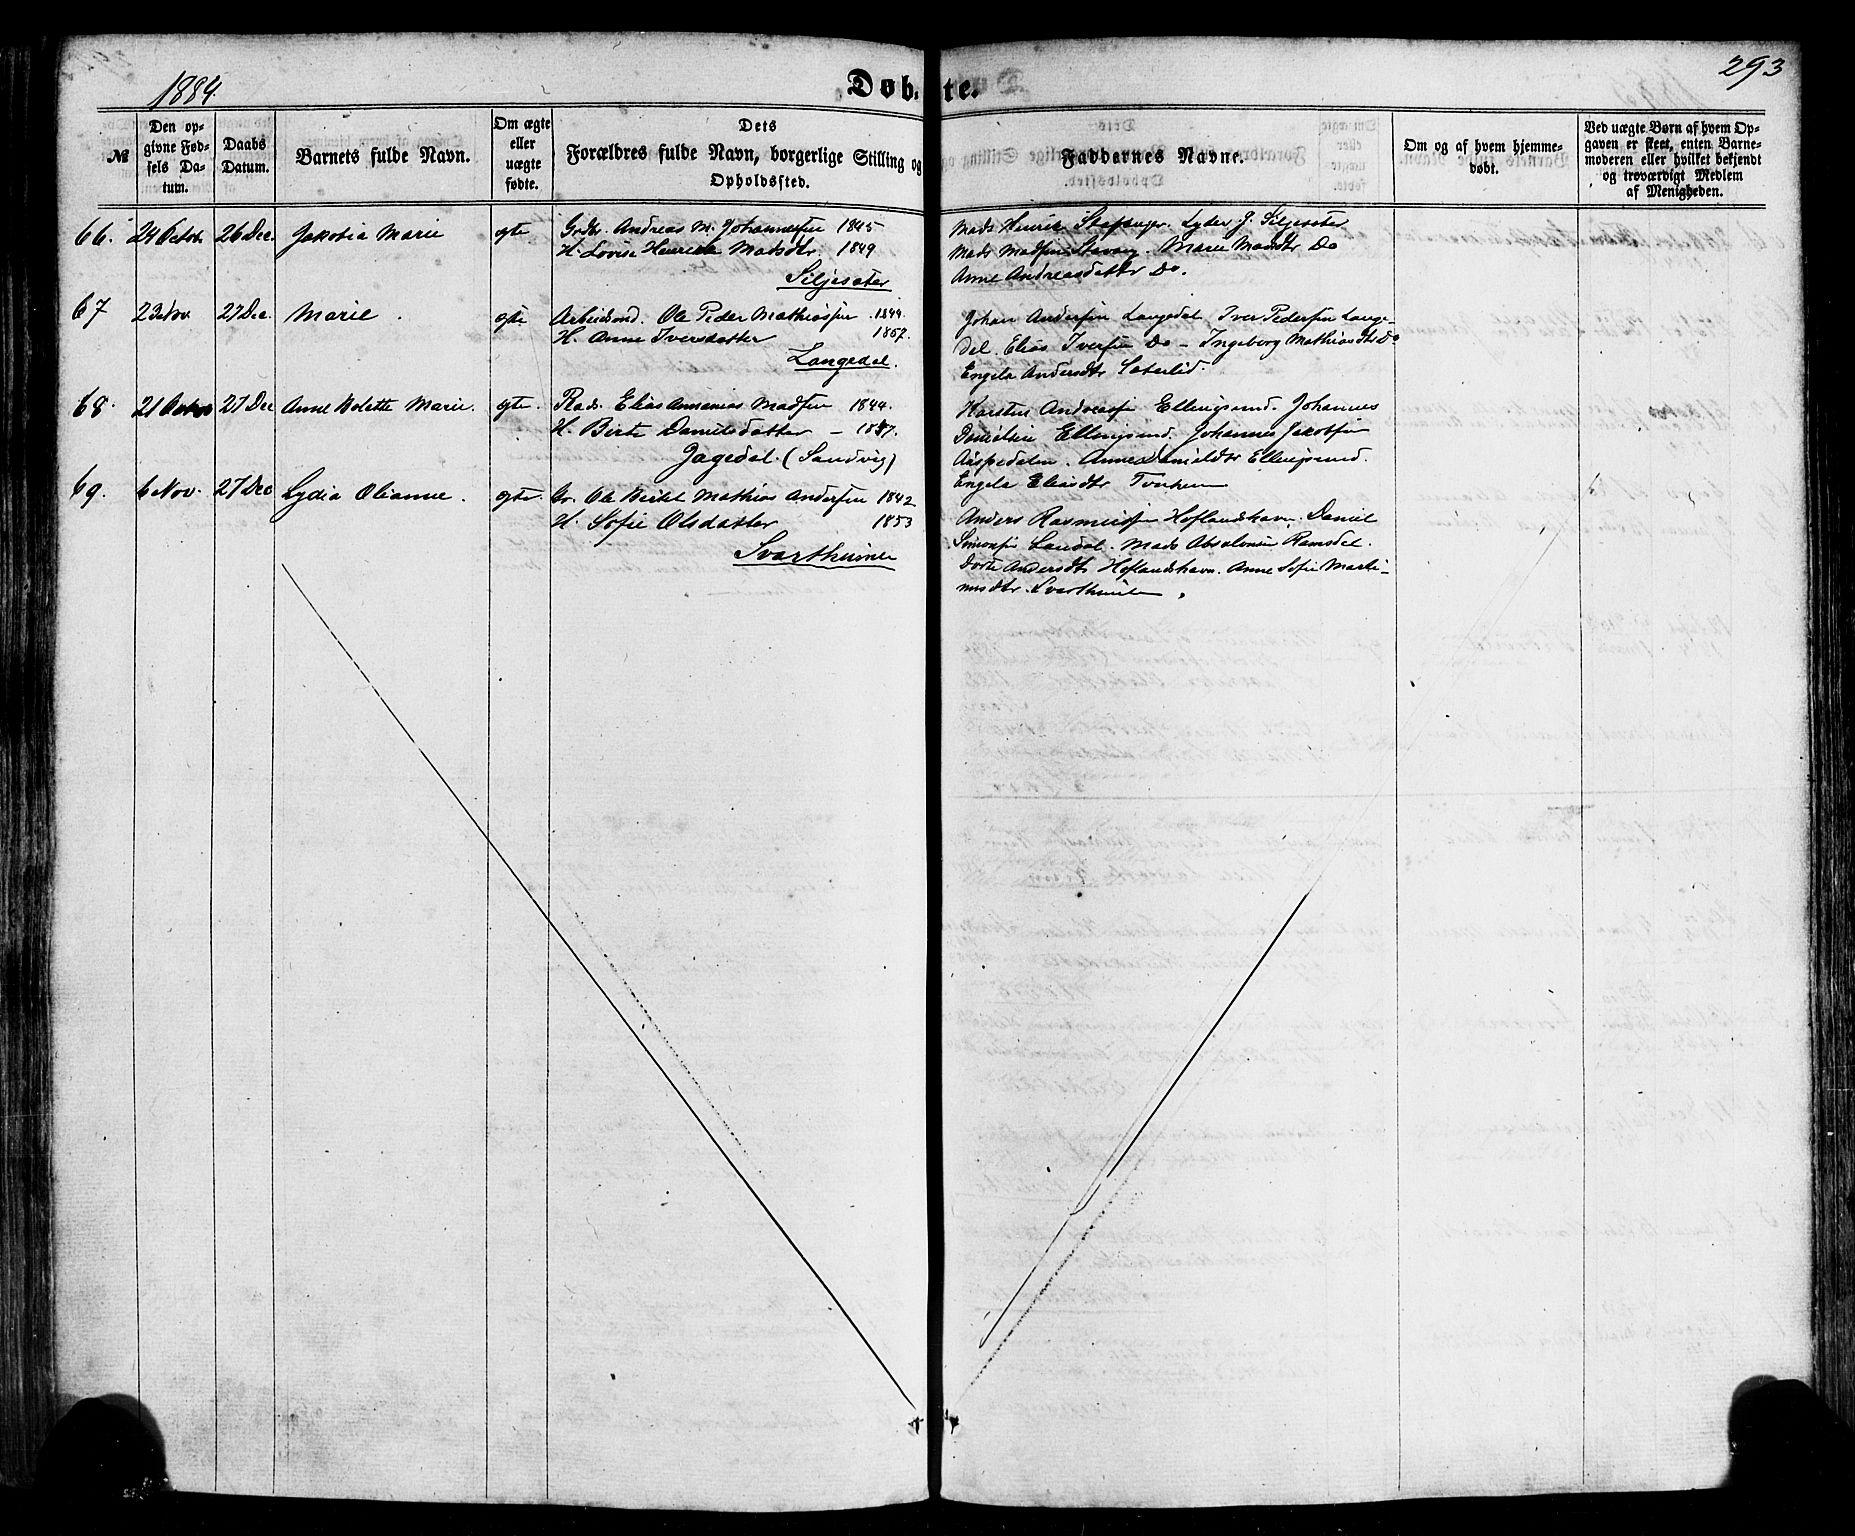 SAB, Kinn sokneprestembete, H/Haa/Haaa/L0006: Ministerialbok nr. A 6, 1857-1885, s. 293